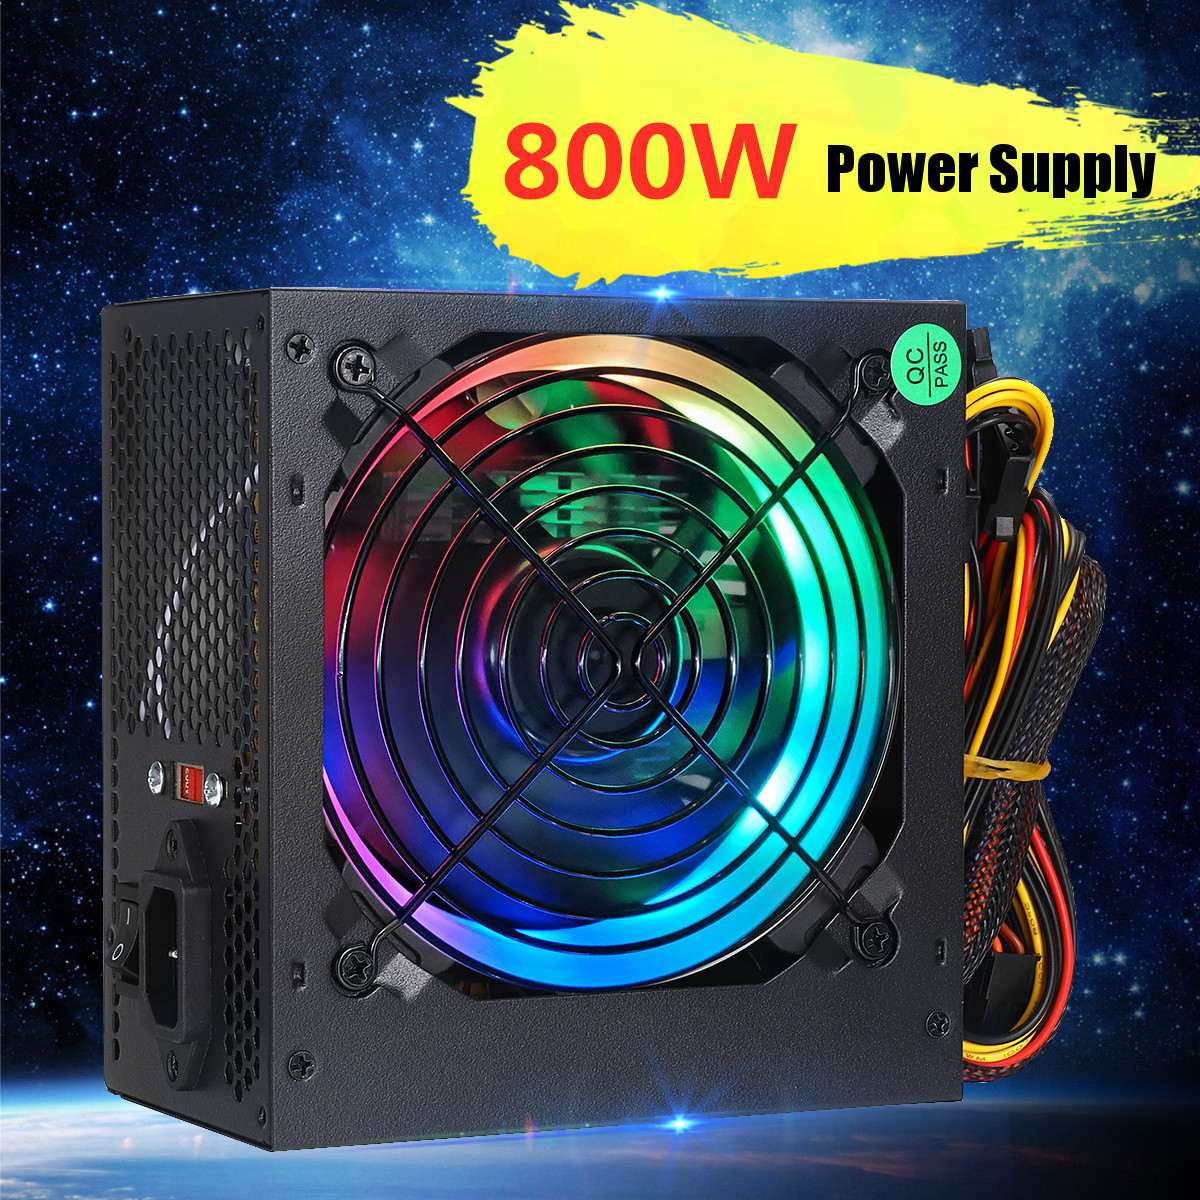 800W 24 Pin PCI SATA 12V PC Power Supply 110/220V Switchable Desktop Computer Power Supply 12cm Multicolor LED Fan